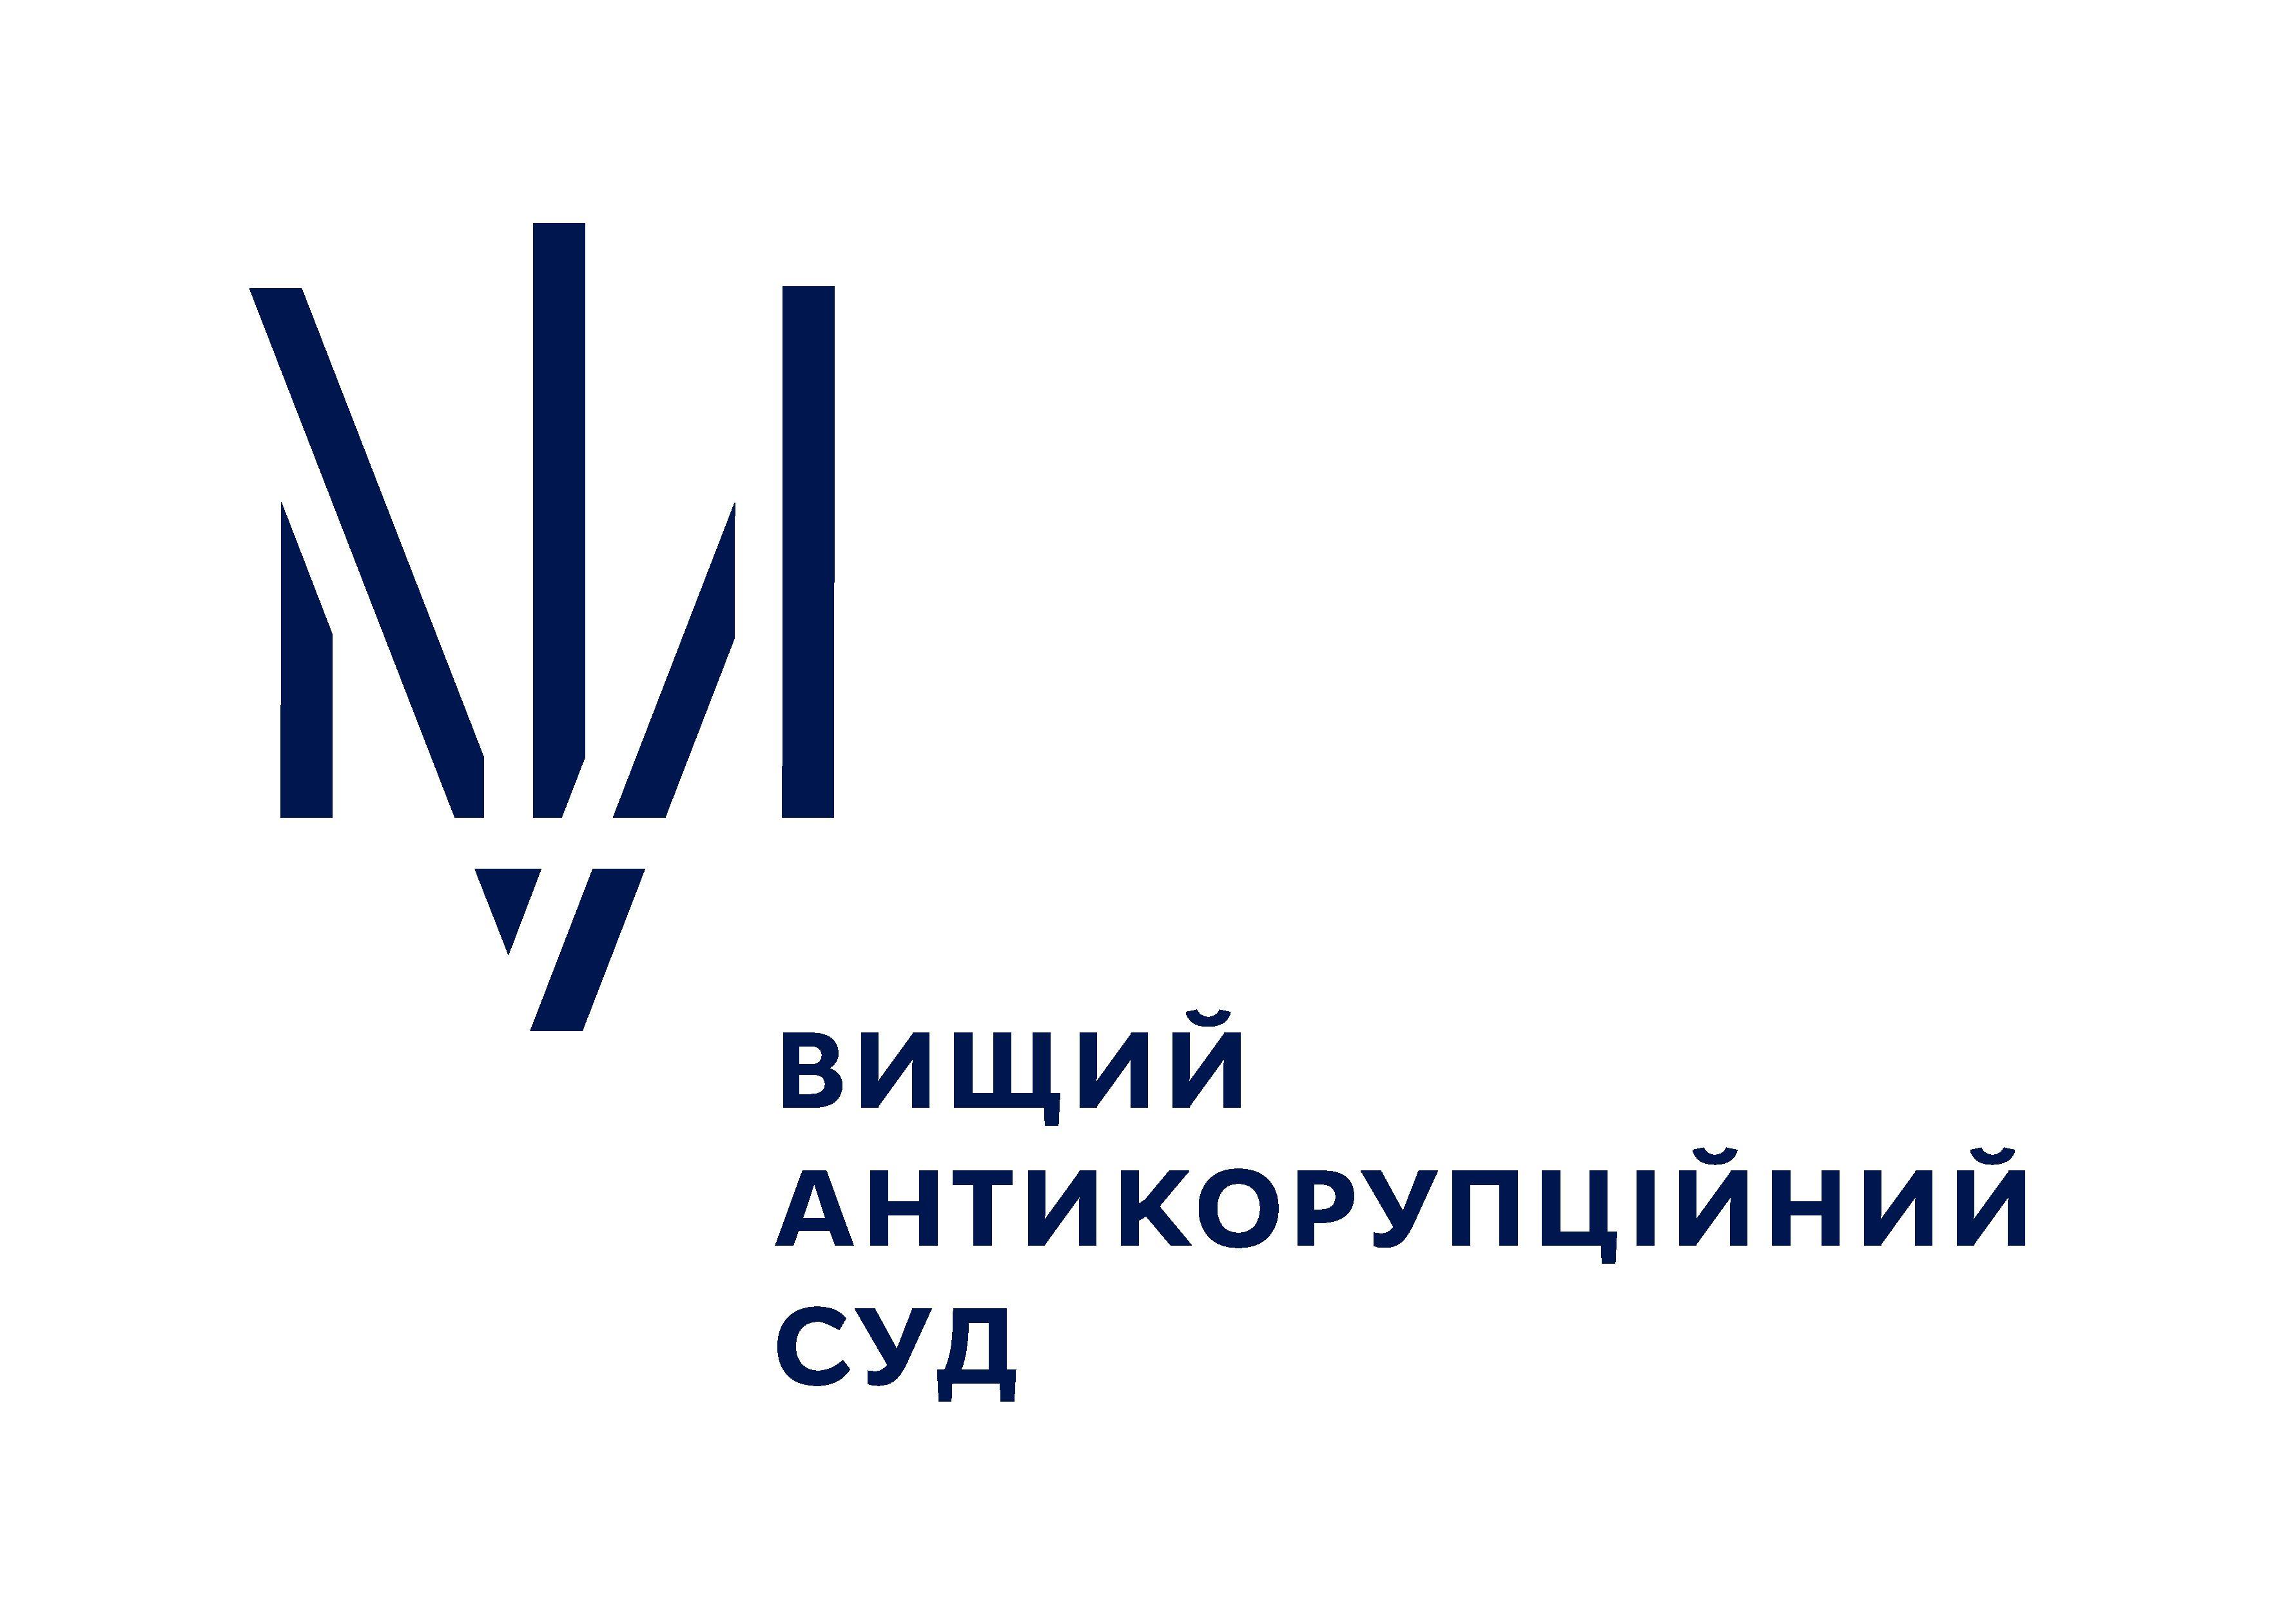 _hacc_700-500mm_UKR